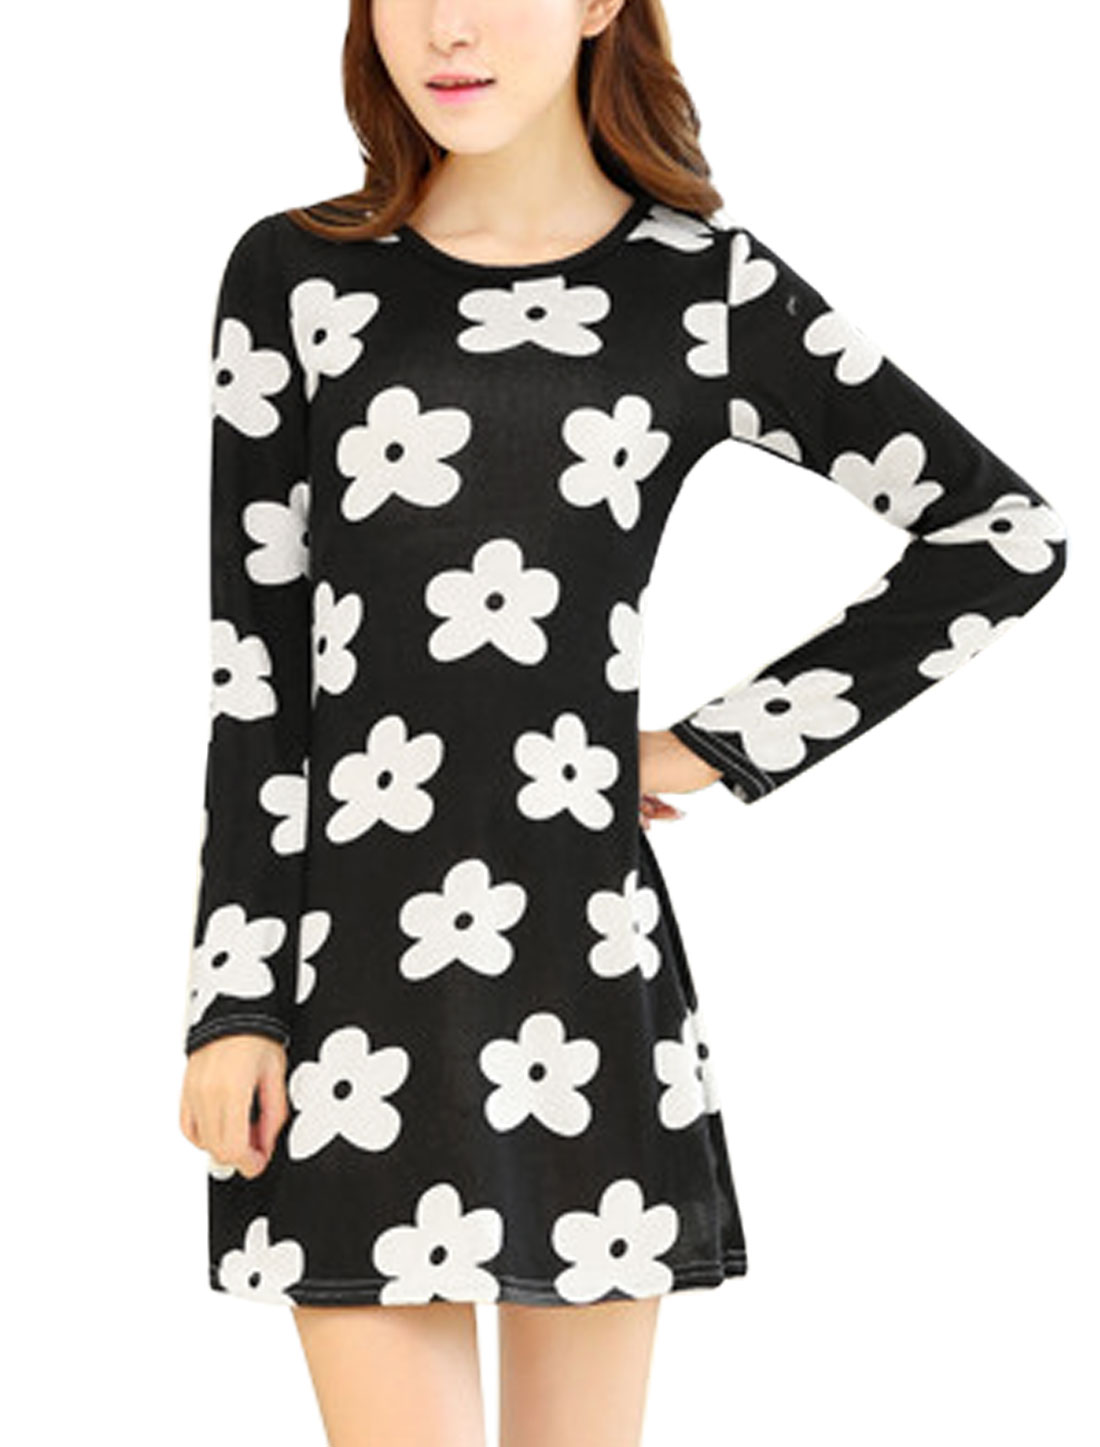 Woman Floral Prints Long Sleeves Cozy Fit Knit Dress Black XS